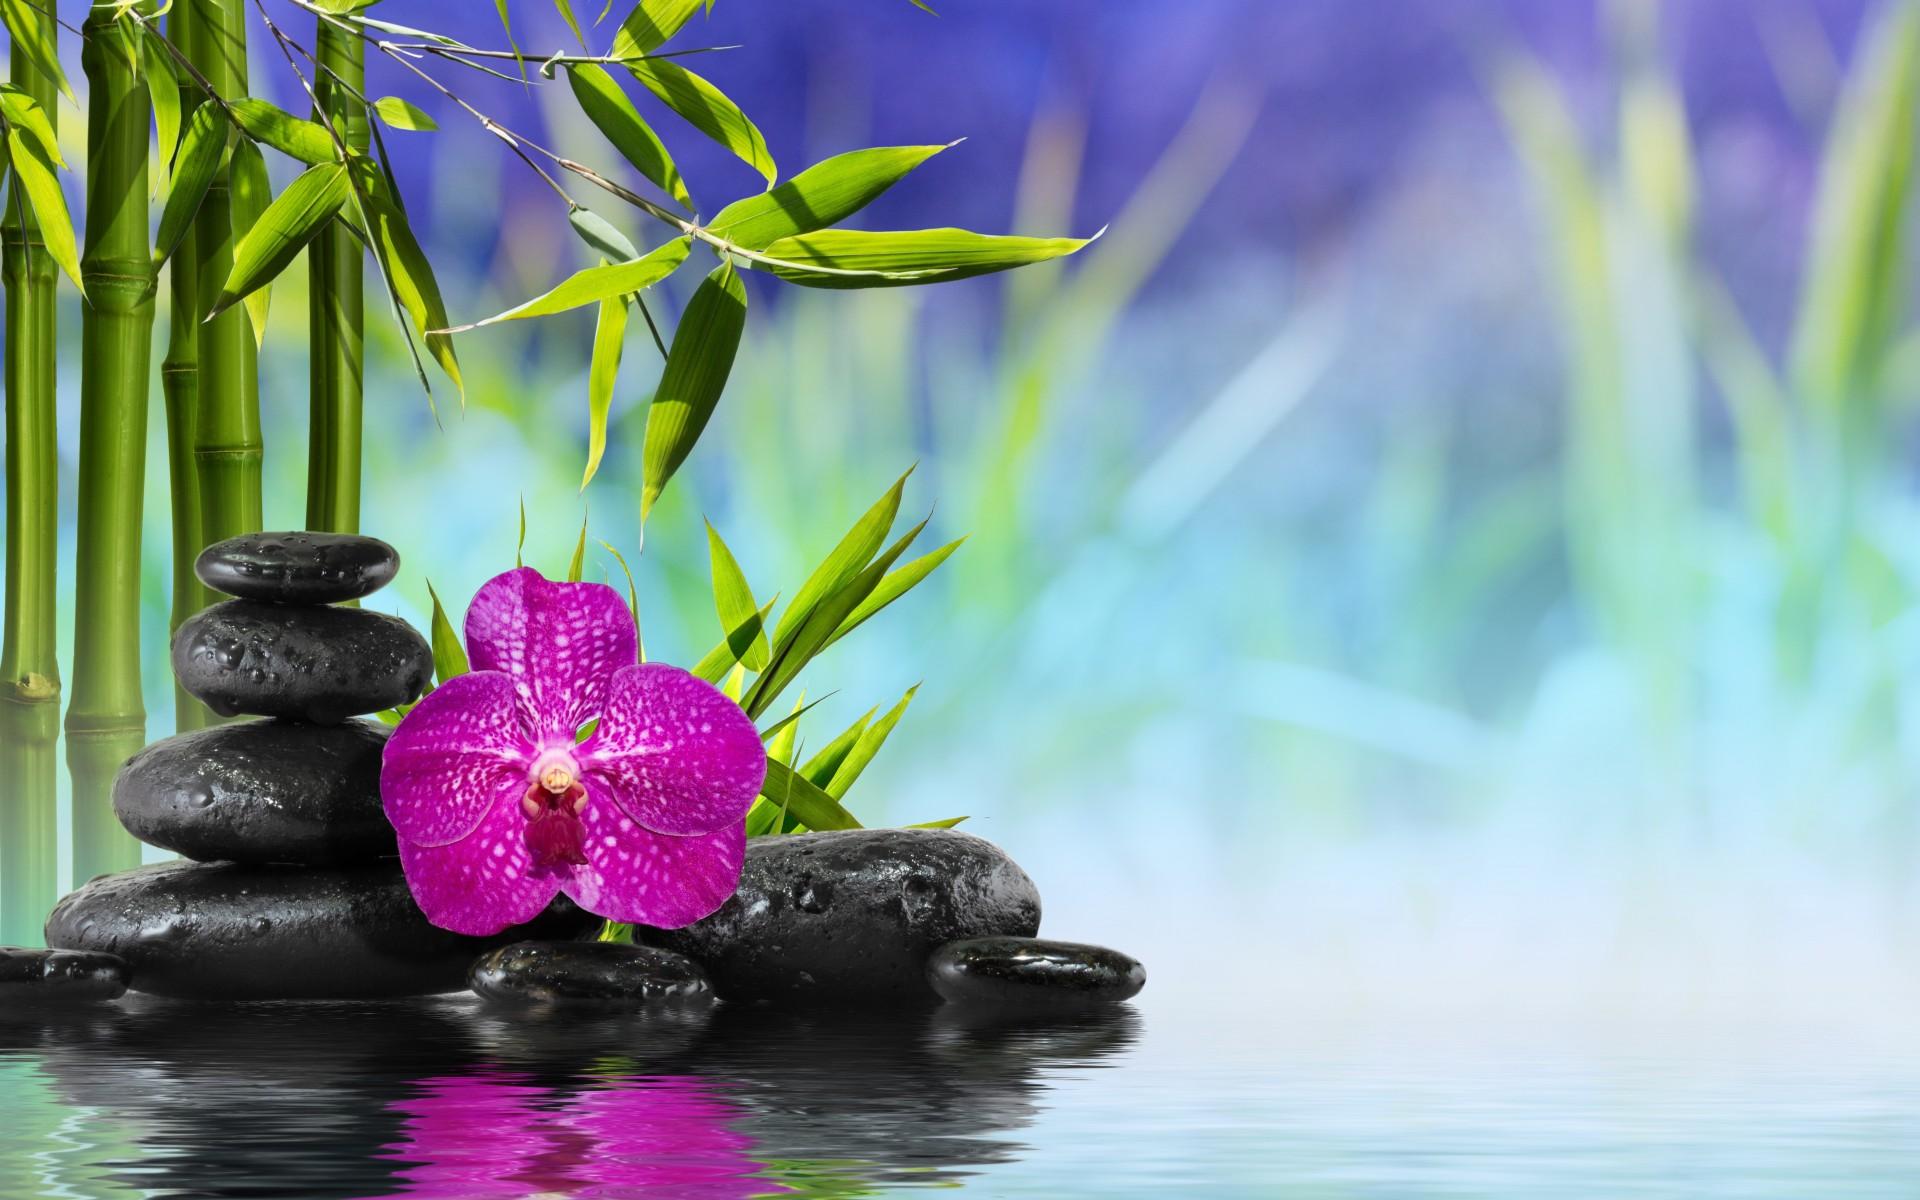 Reflection clipart island flower #5